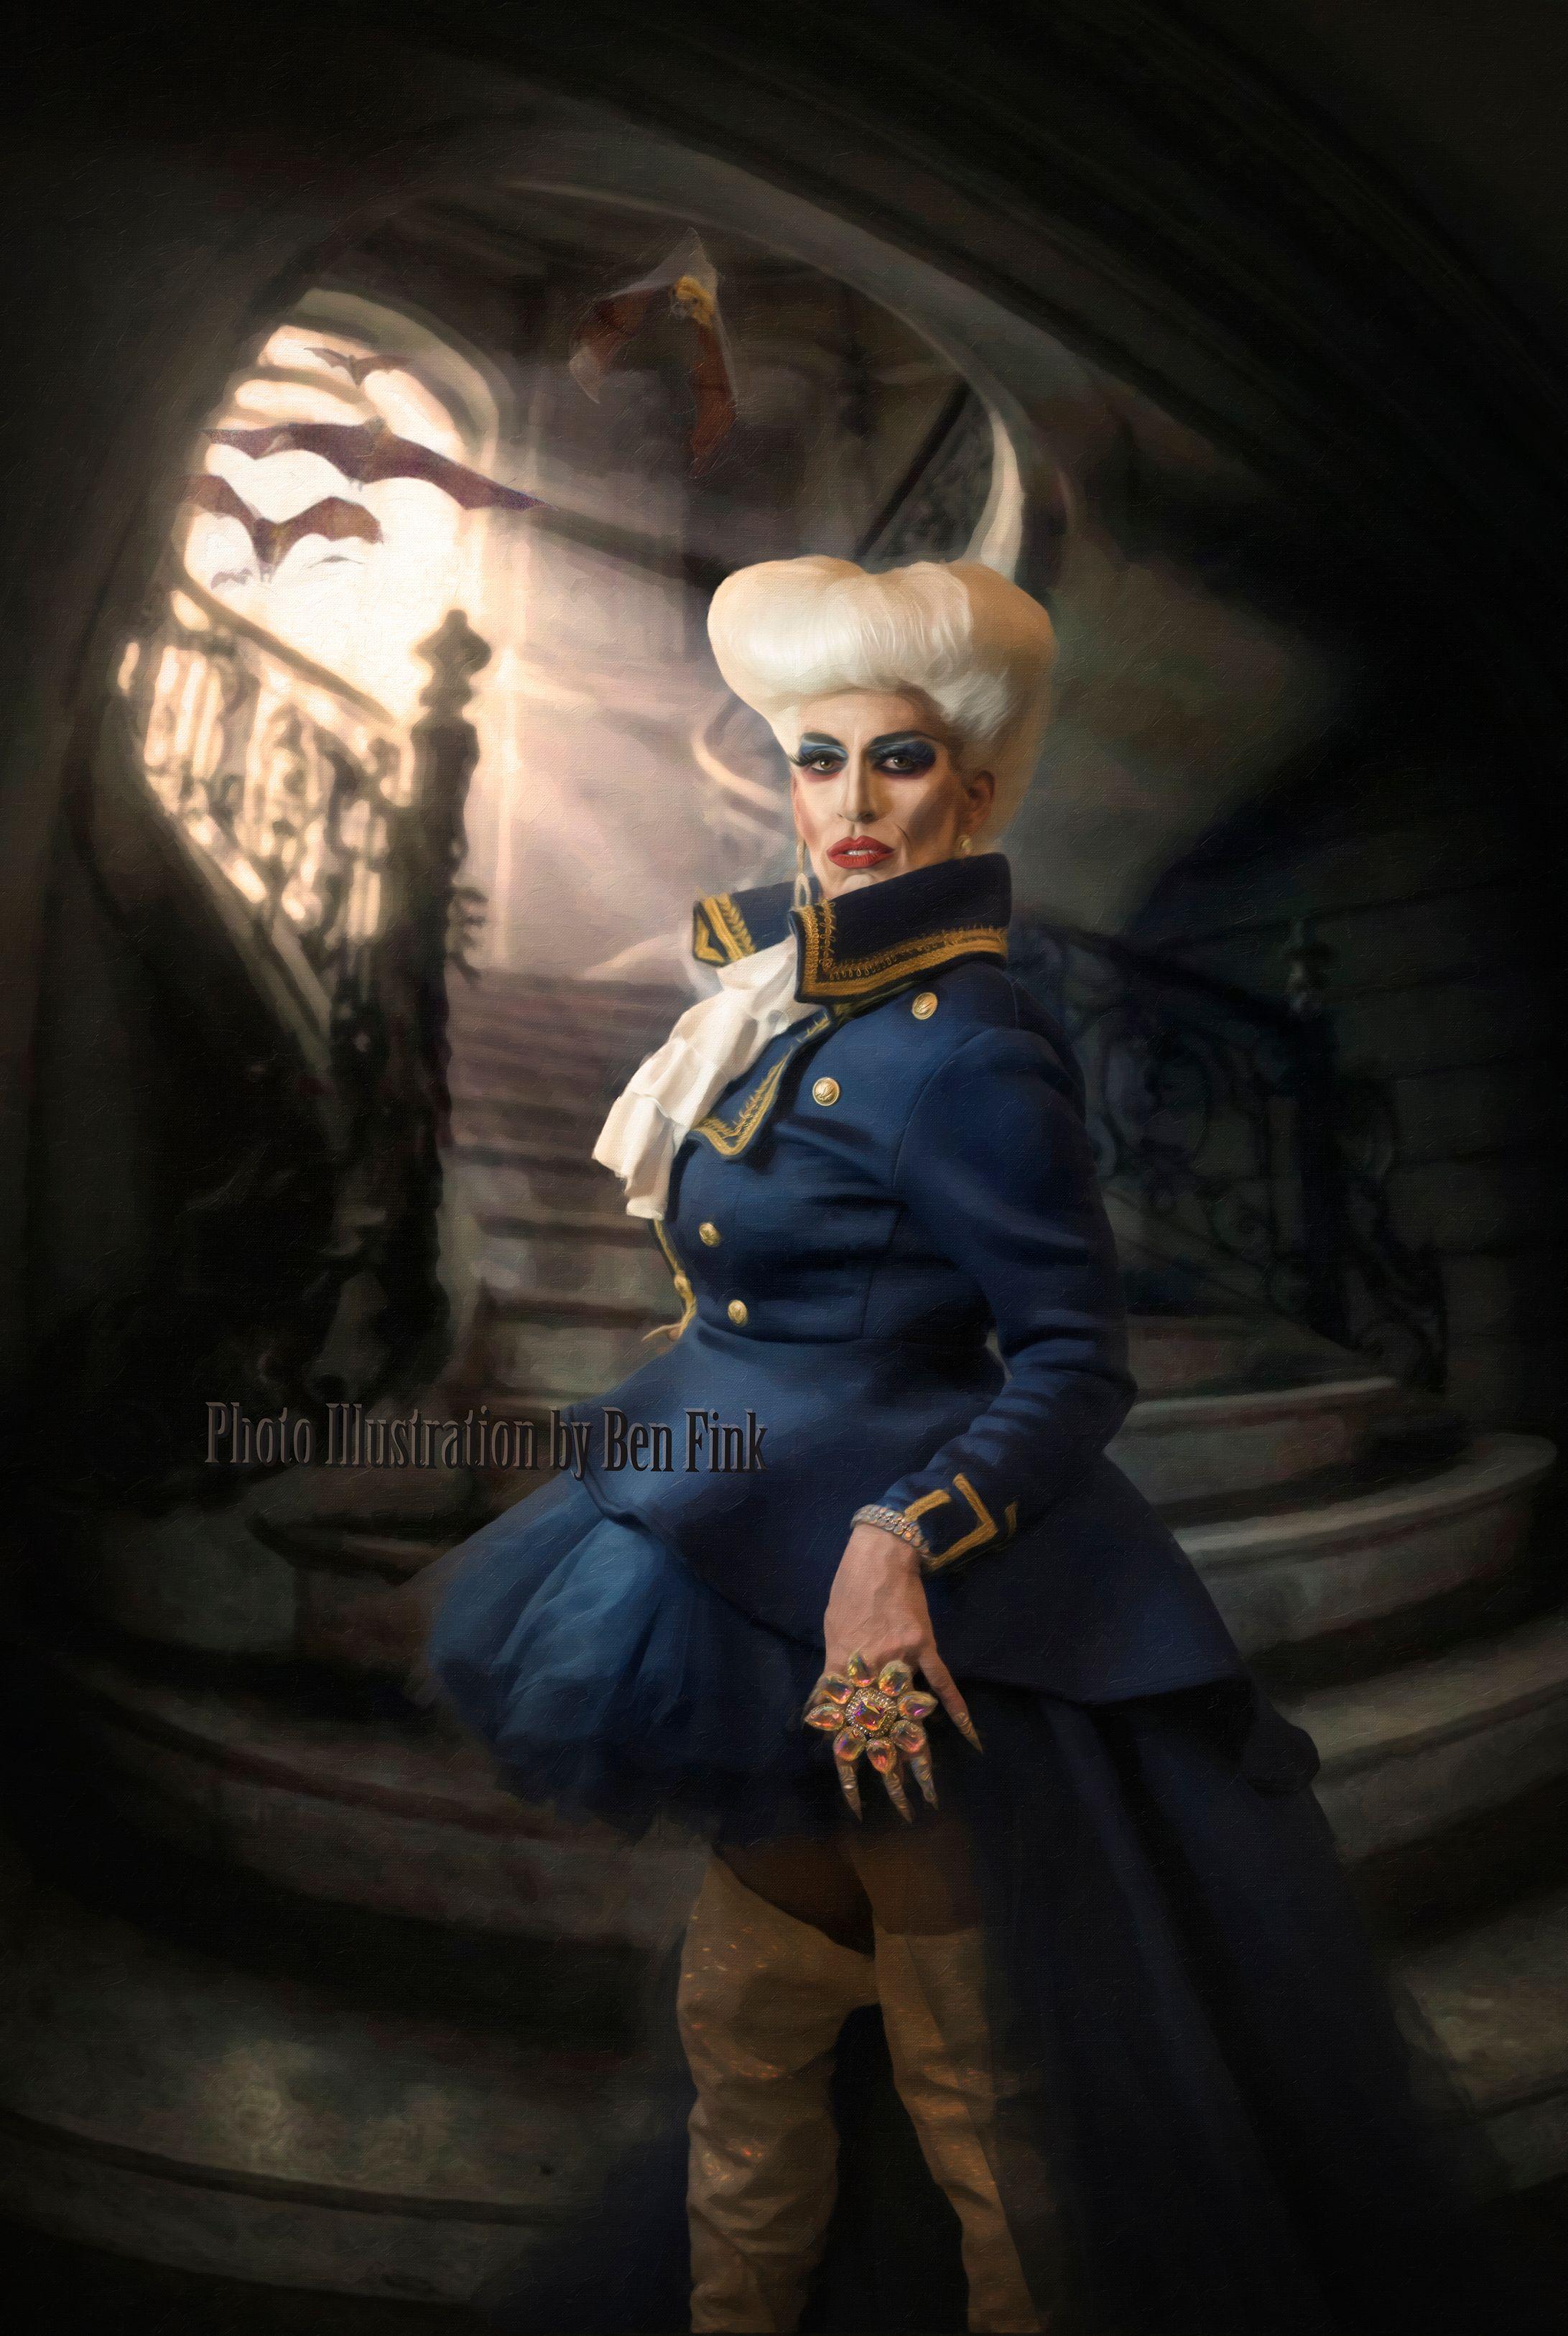 Imperial court_-1004855a.jpg